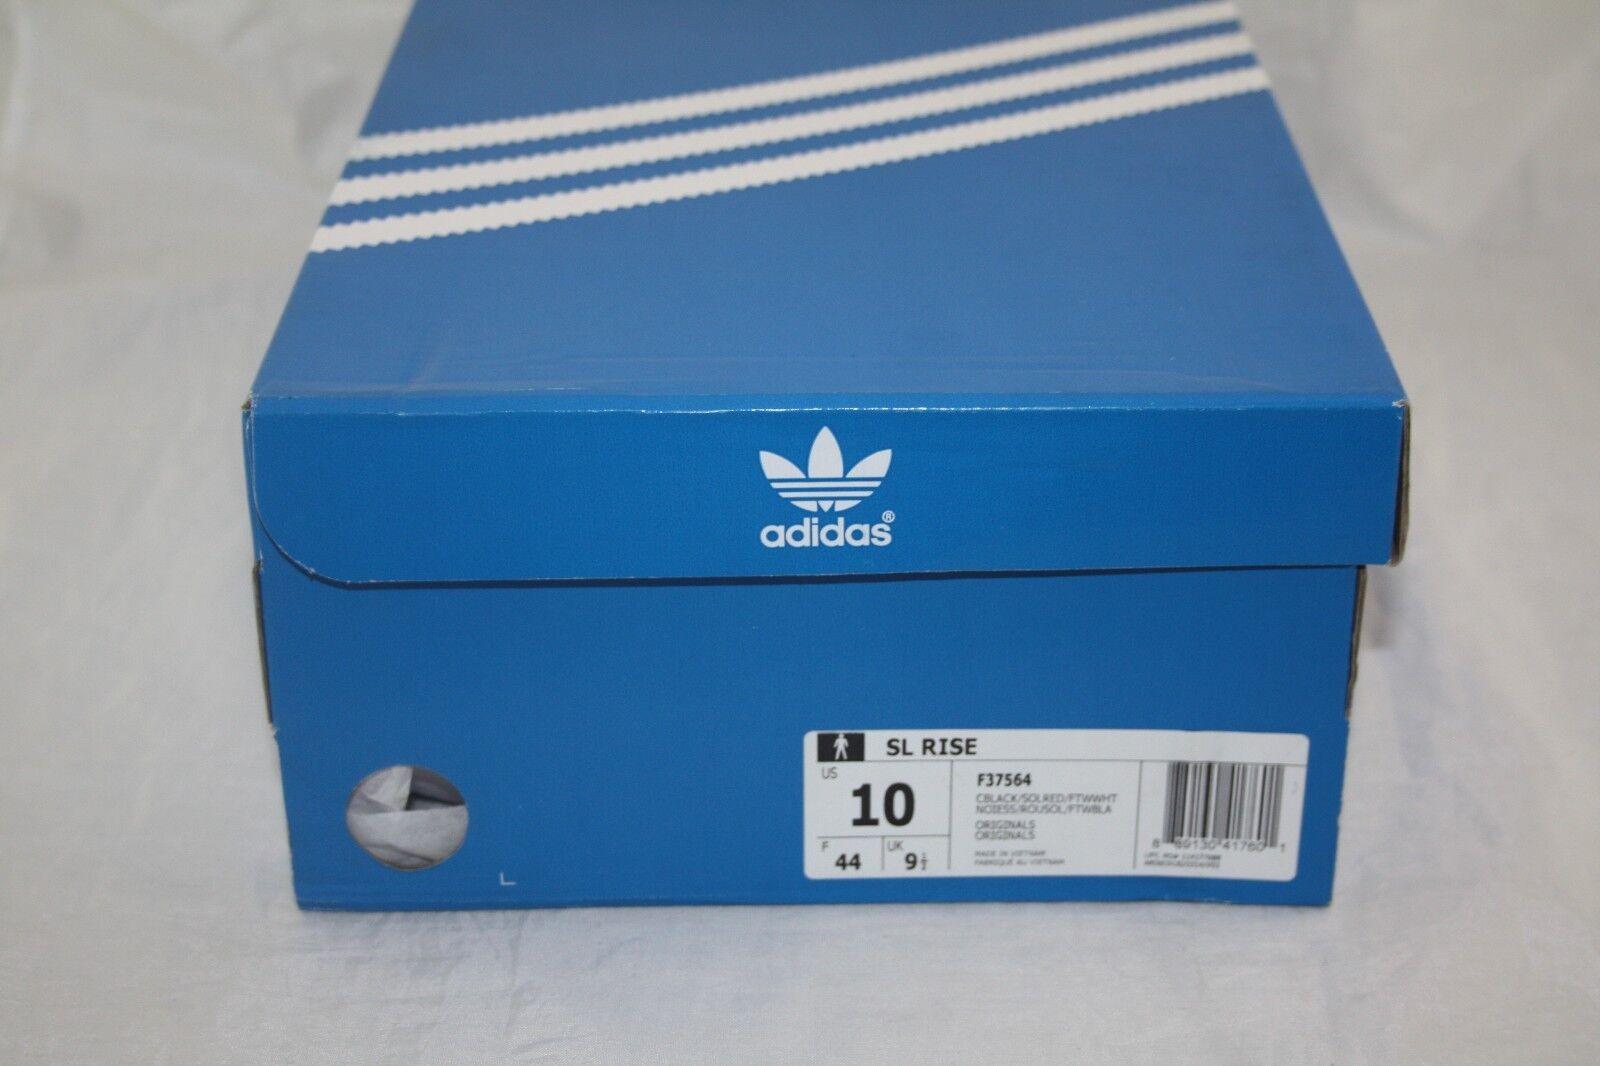 f37564 adidas sl solred steigen original cblack / solred sl / ftwwht größe 10 n11 avalible 07be04